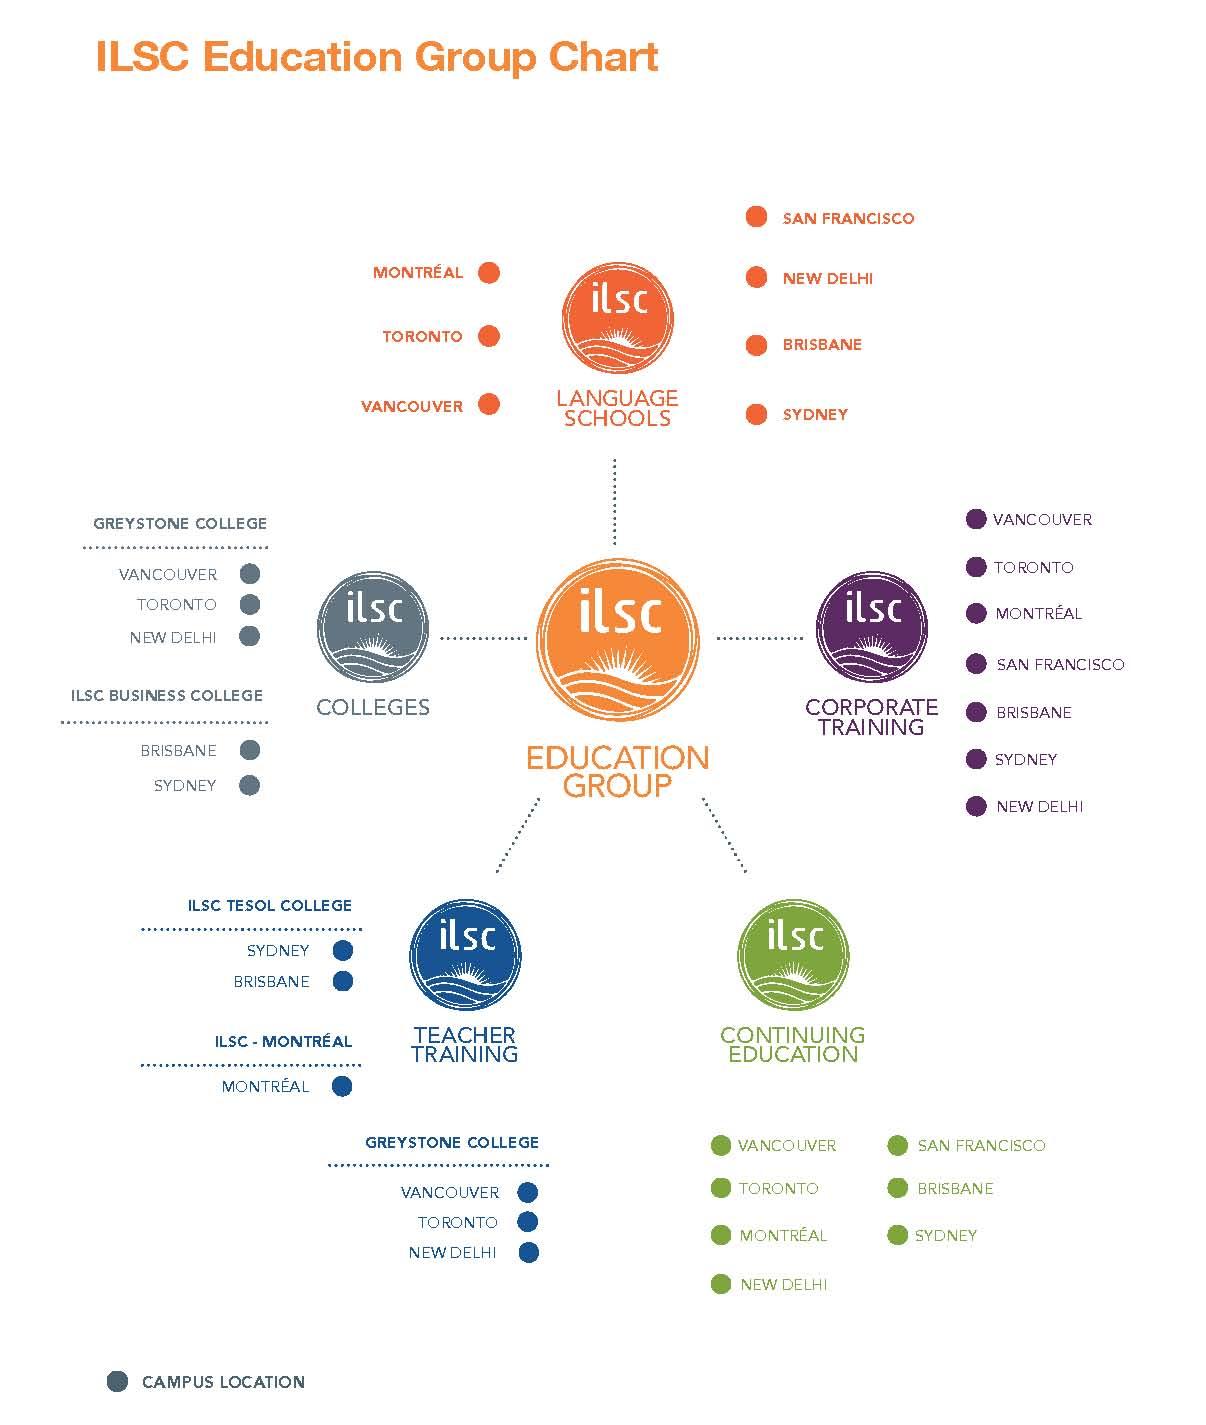 ILSC Education Group Chart